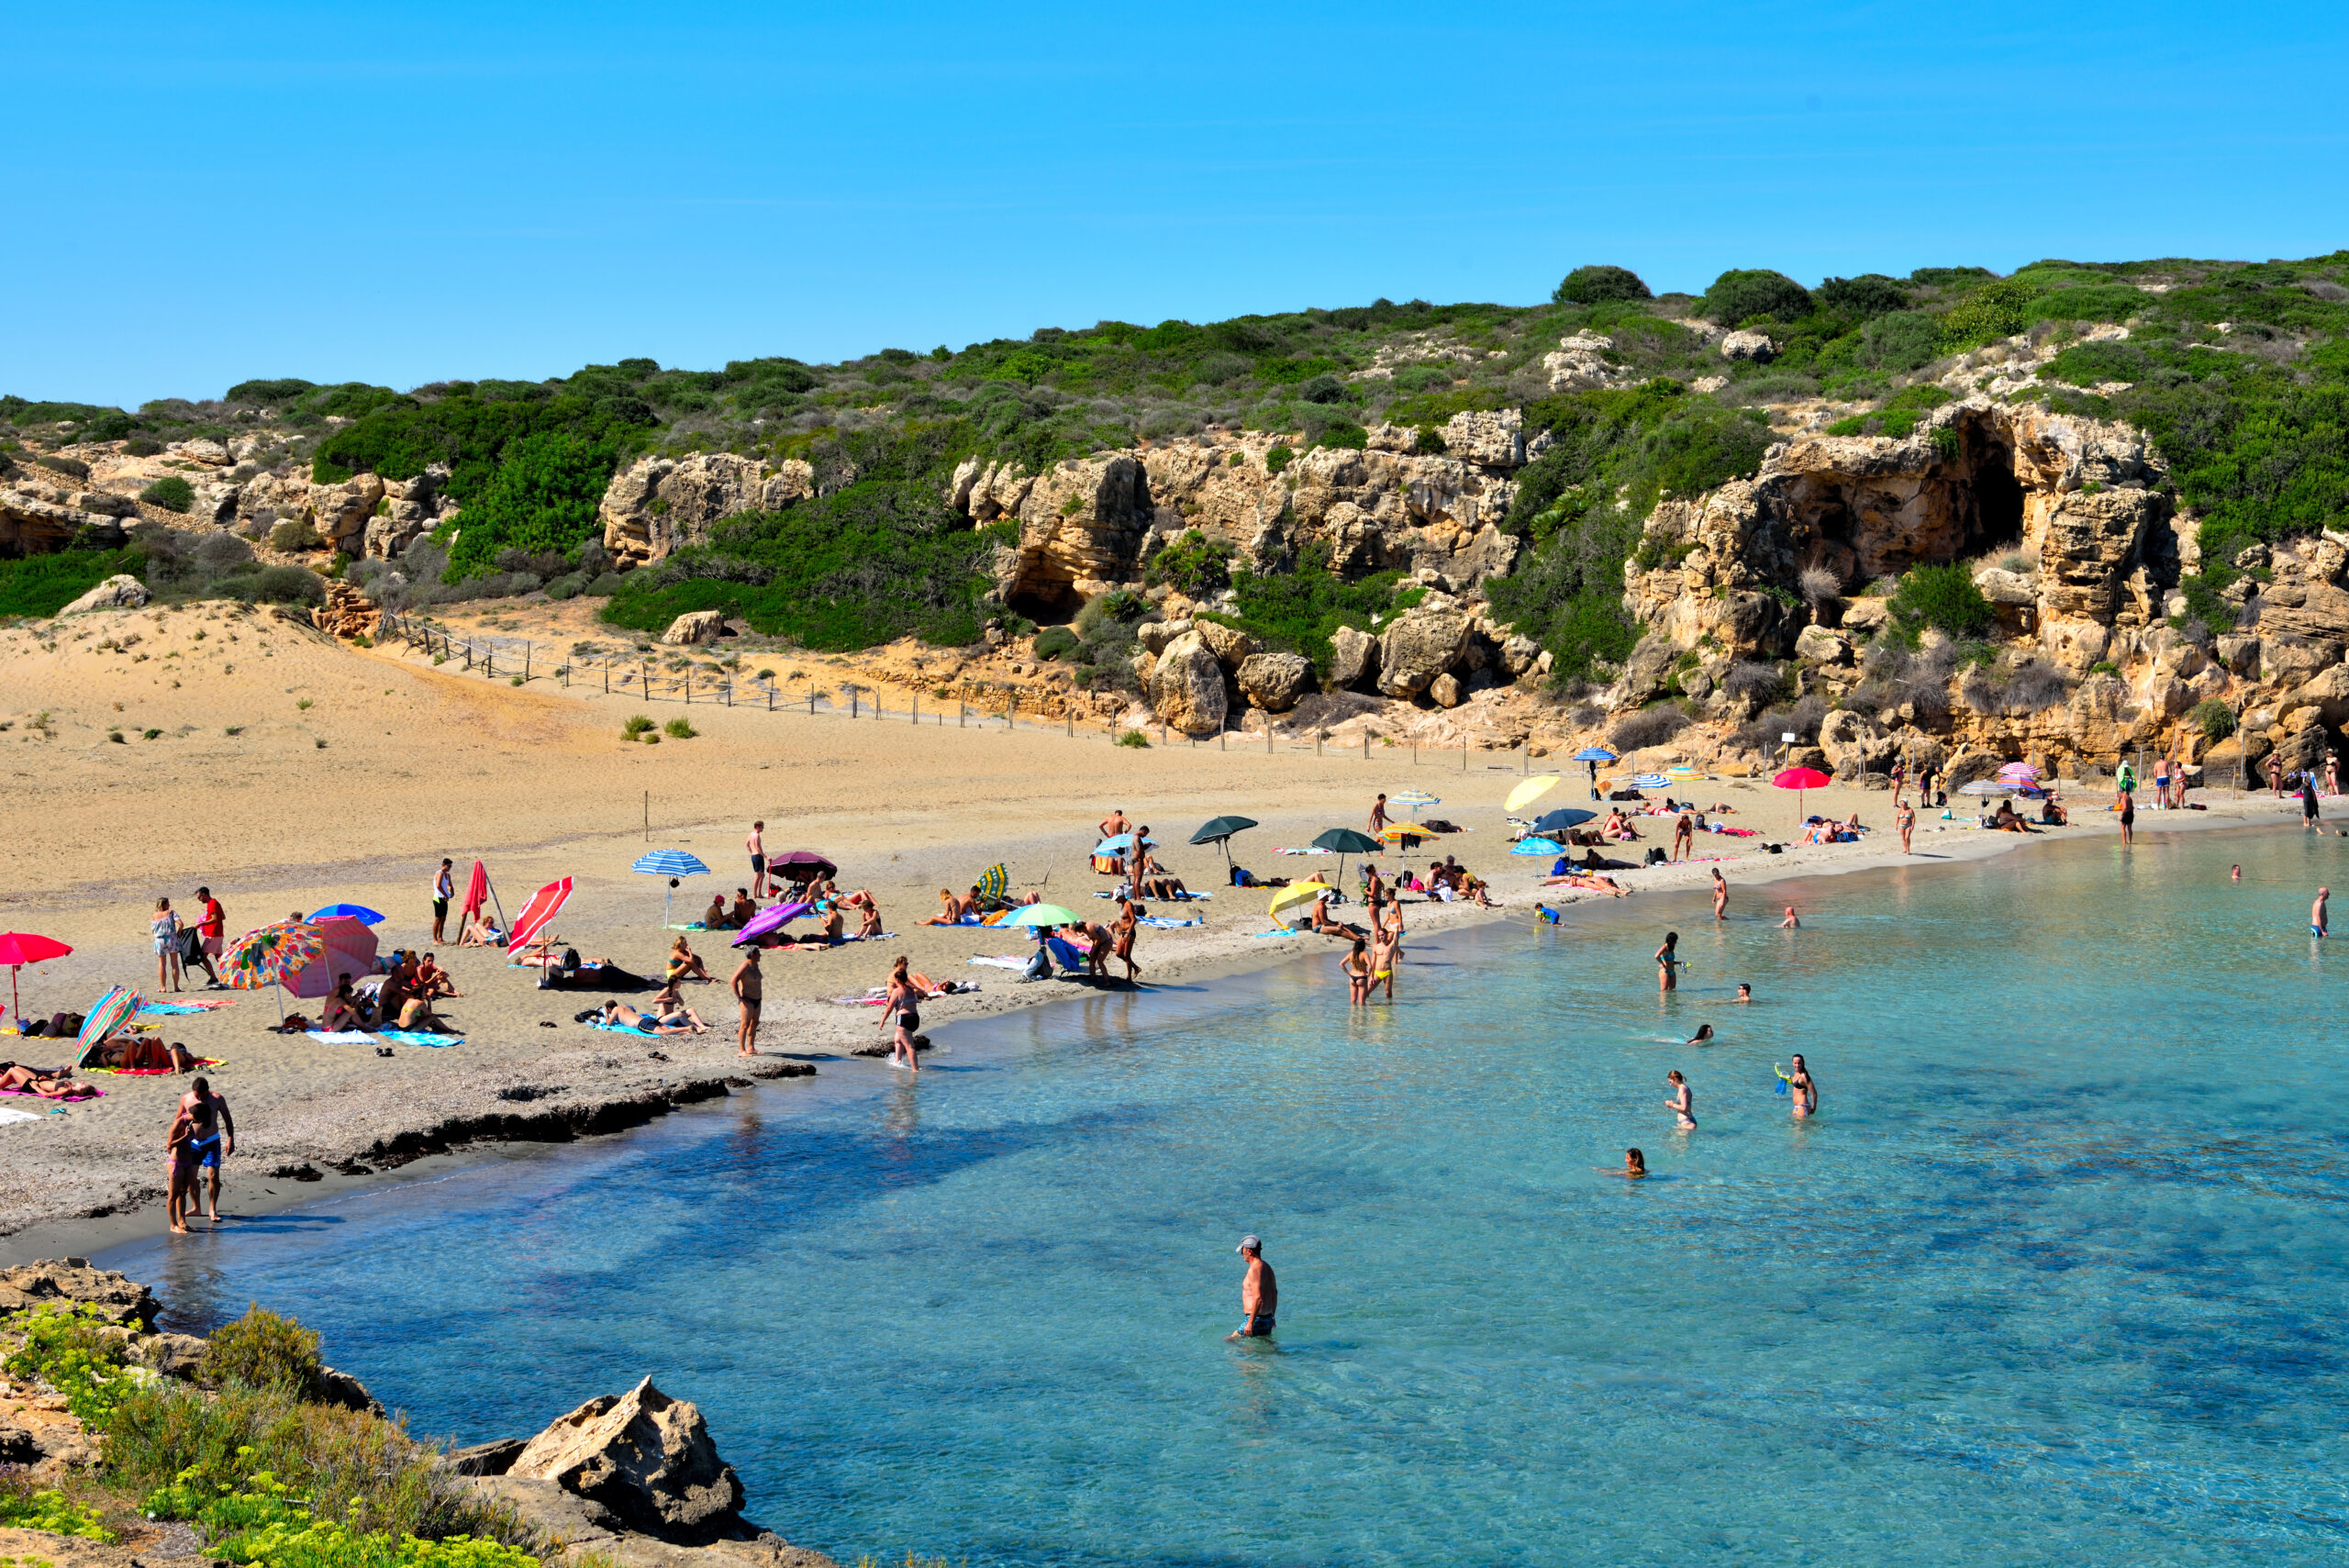 Plaża Cala mosche, licencja: shutterstock/By maudanros